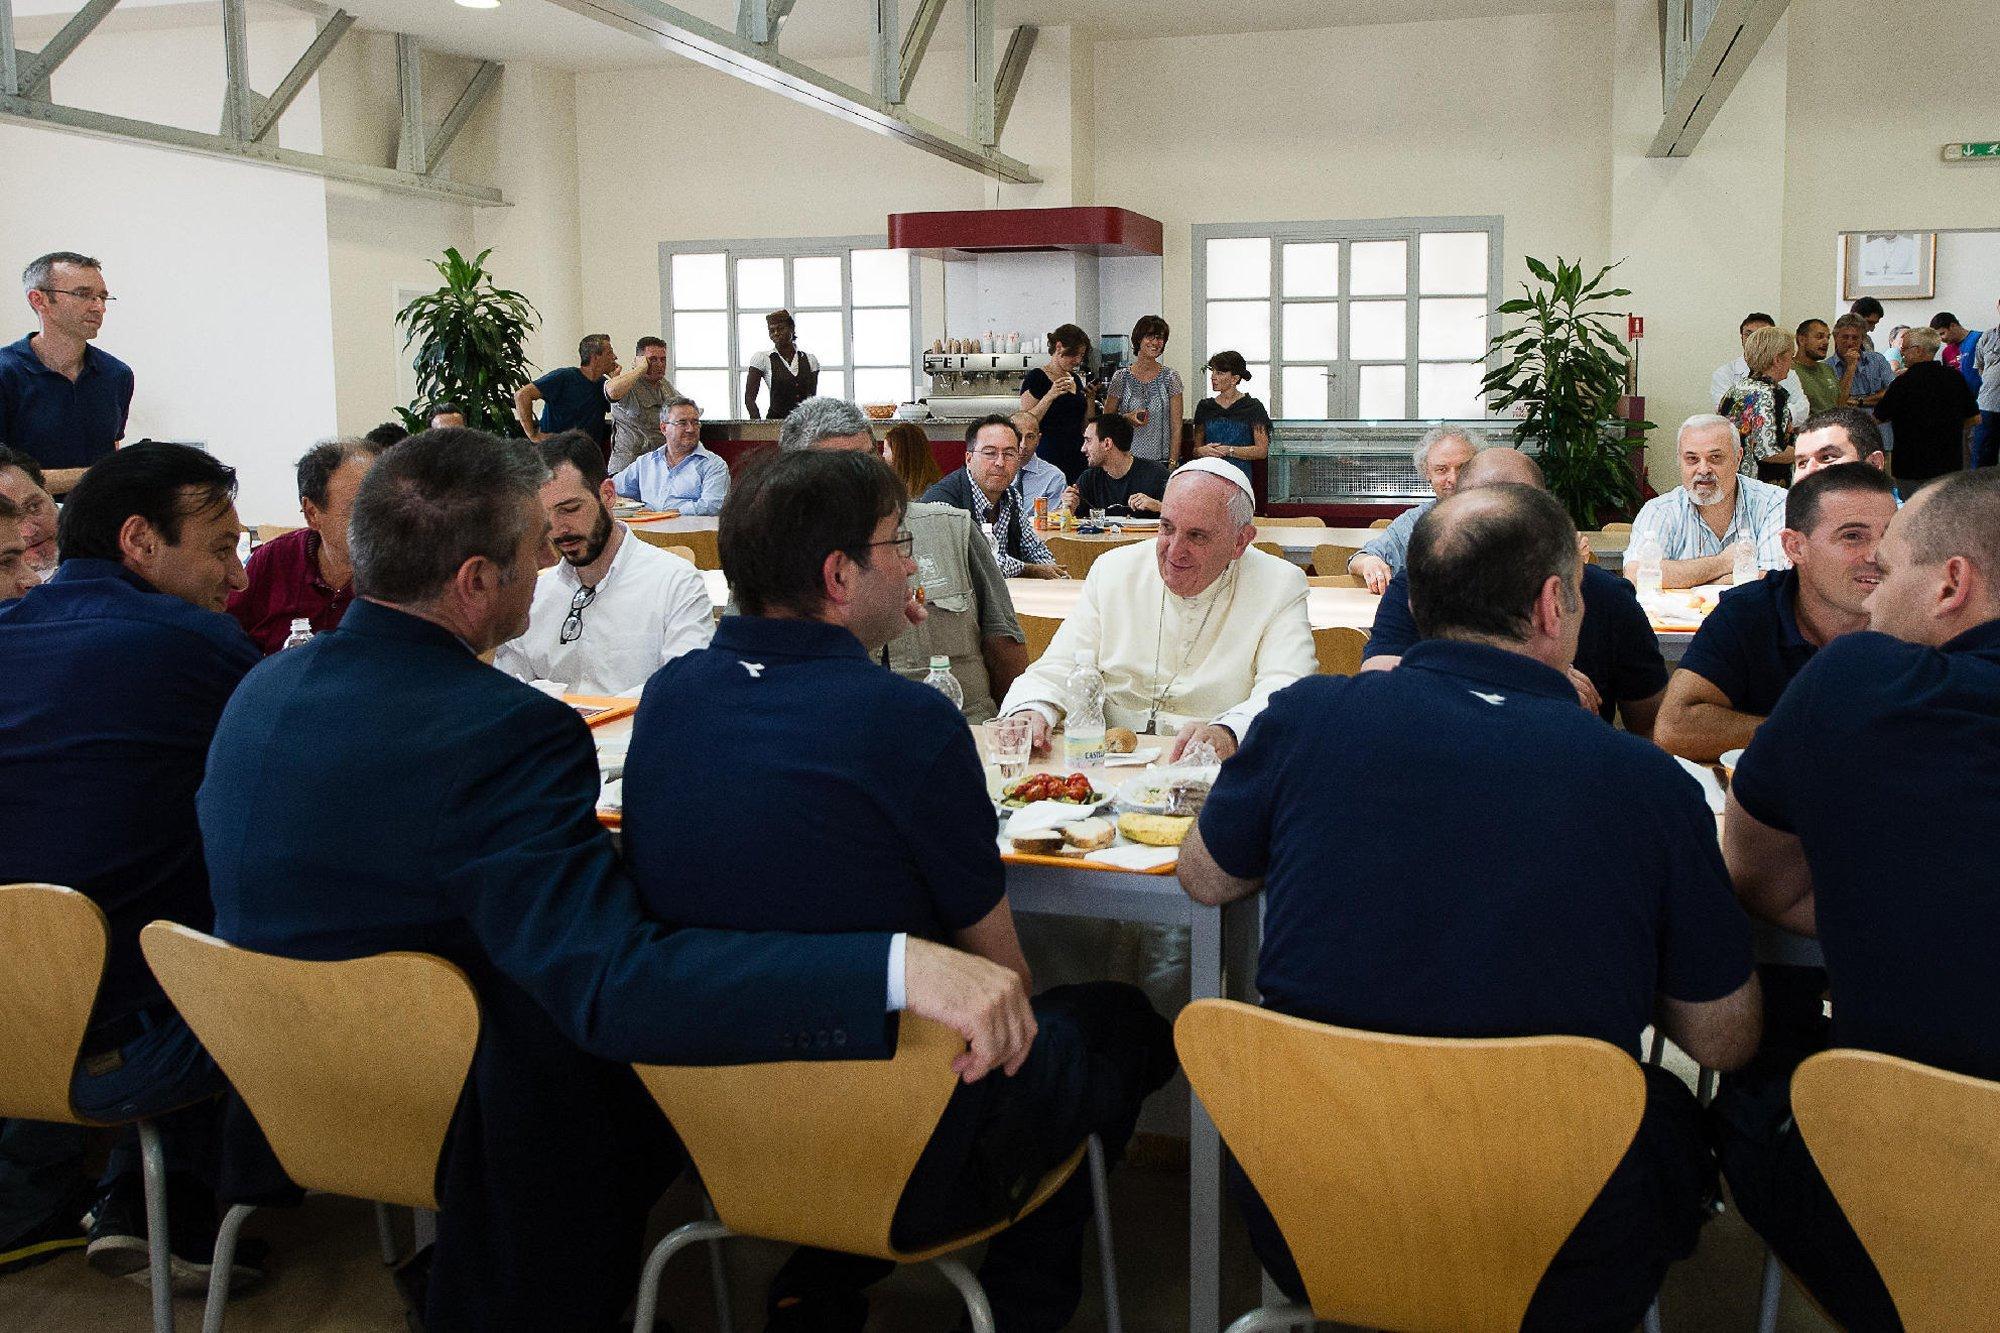 Image:  Meriam Ibrahim, Pope Francis, Daniel Wani, Martin, Maya